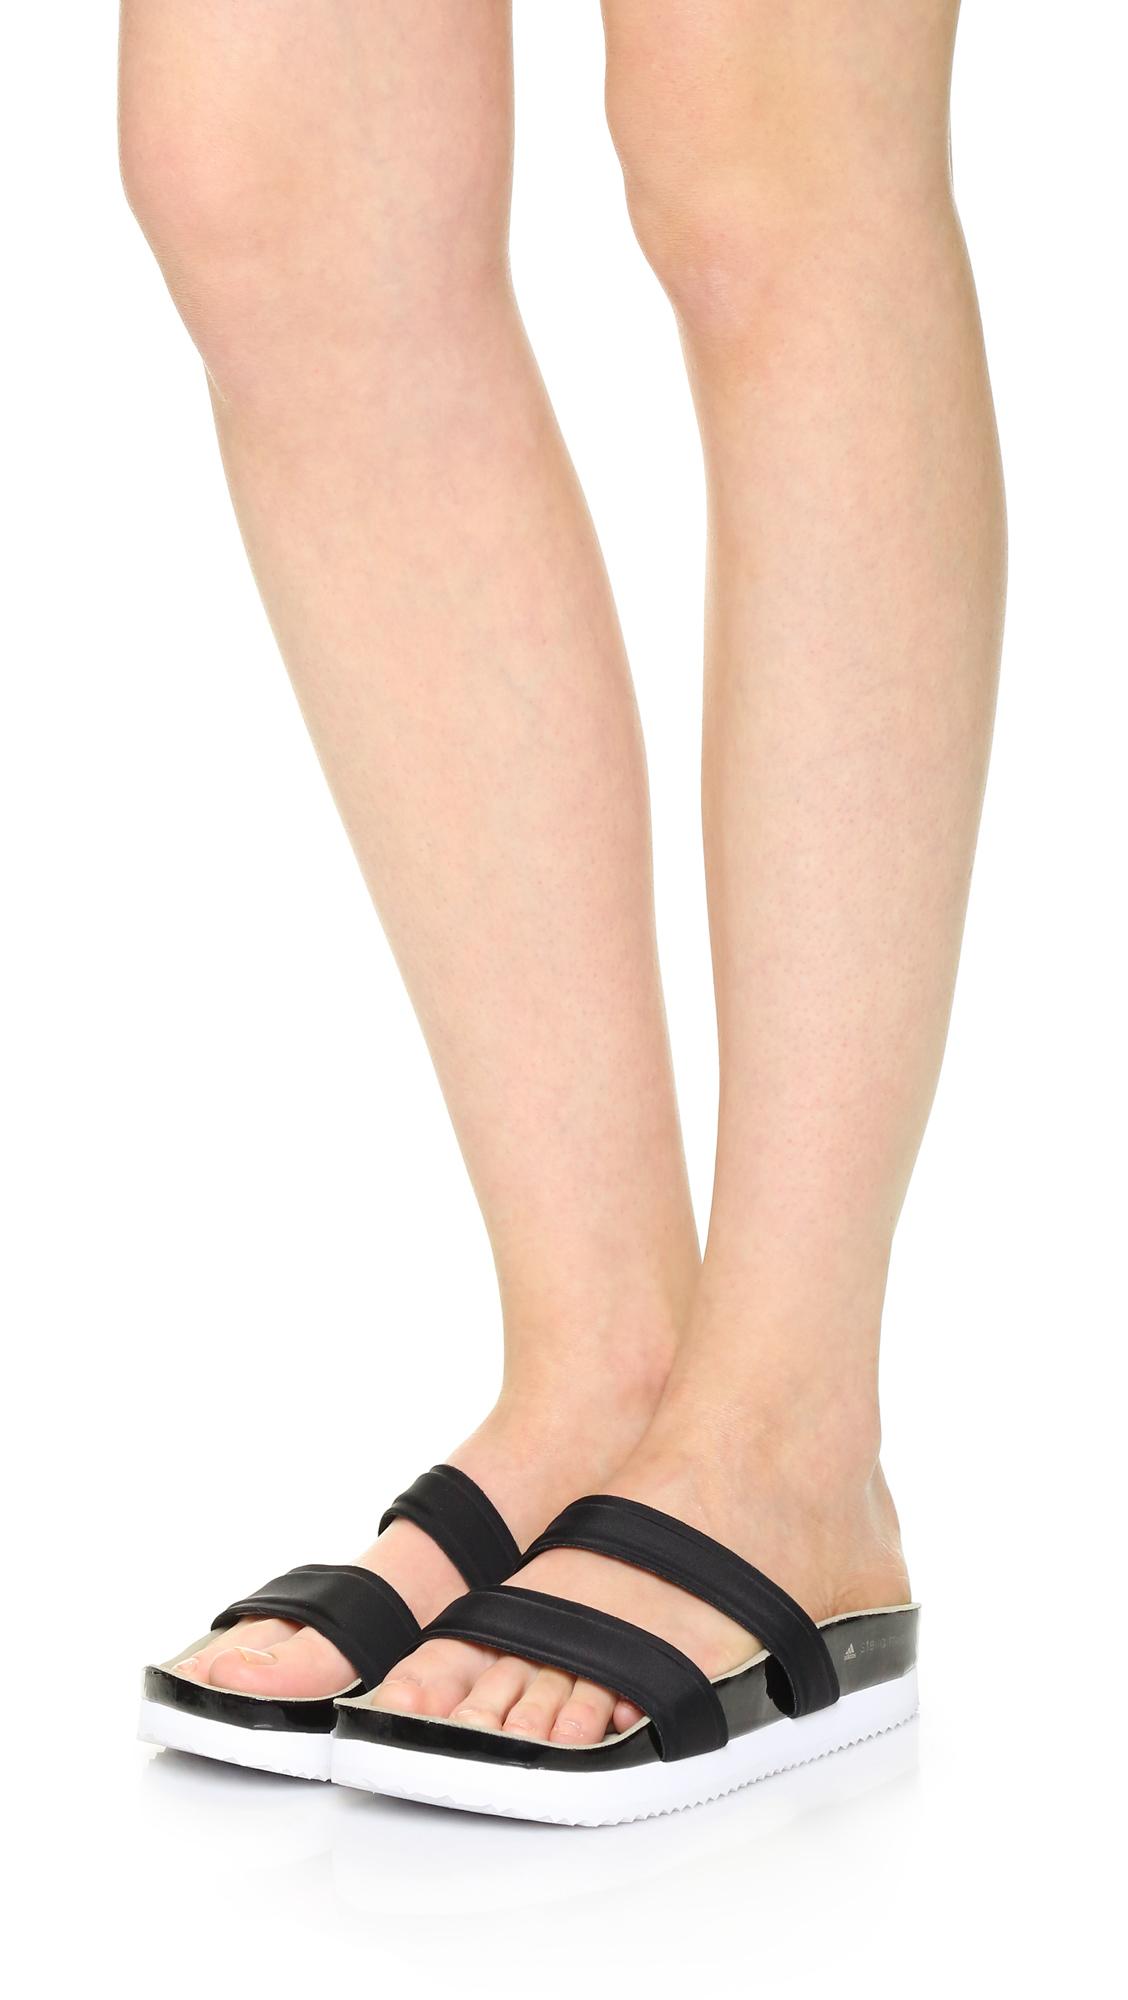 2326c31c845c Adidas By Stella Mccartney Diadophis Slide Sandals in Black - Lyst